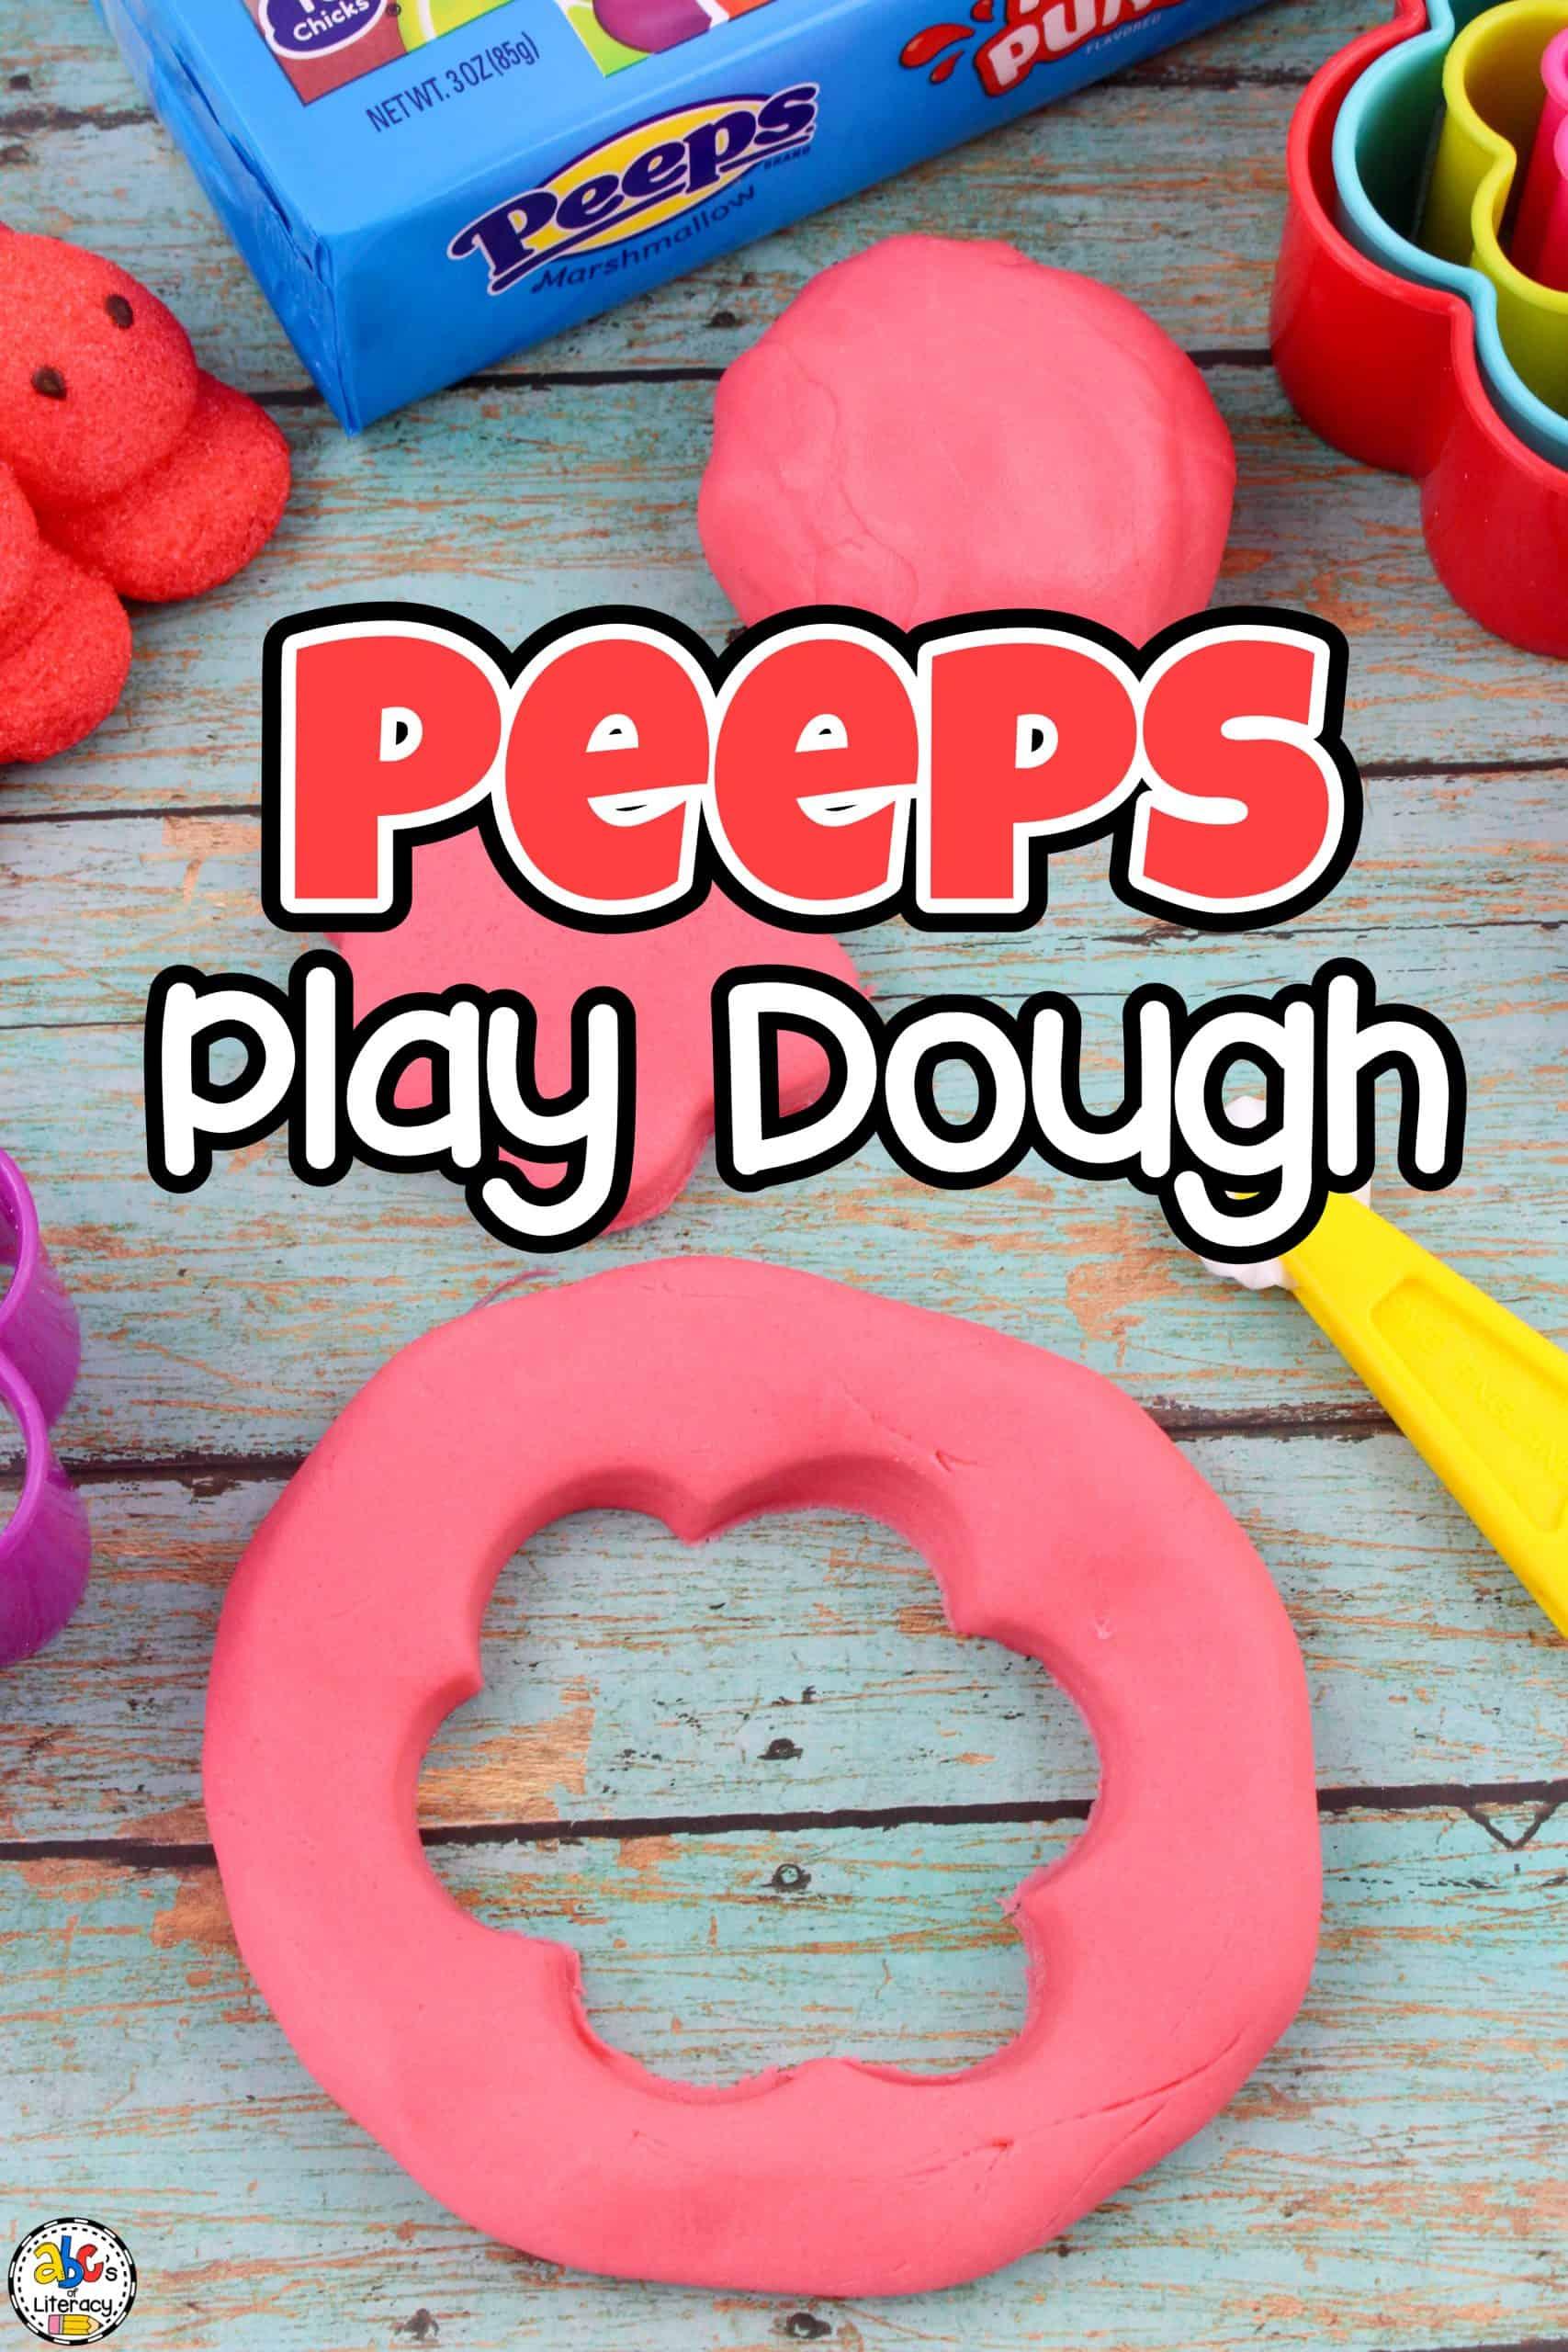 Peeps Play Dough